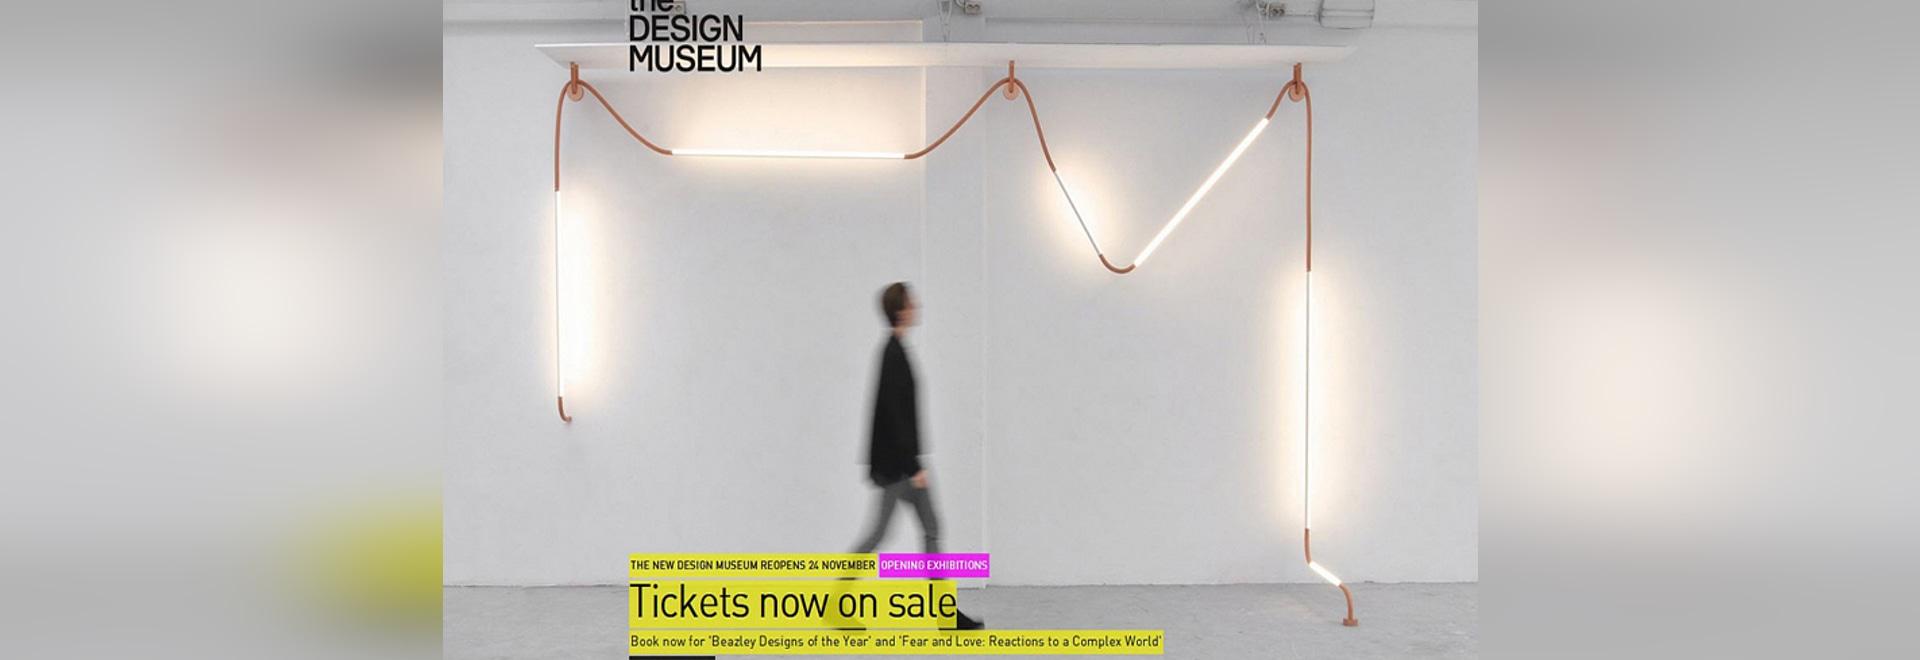 Londra: Il museo ibrido